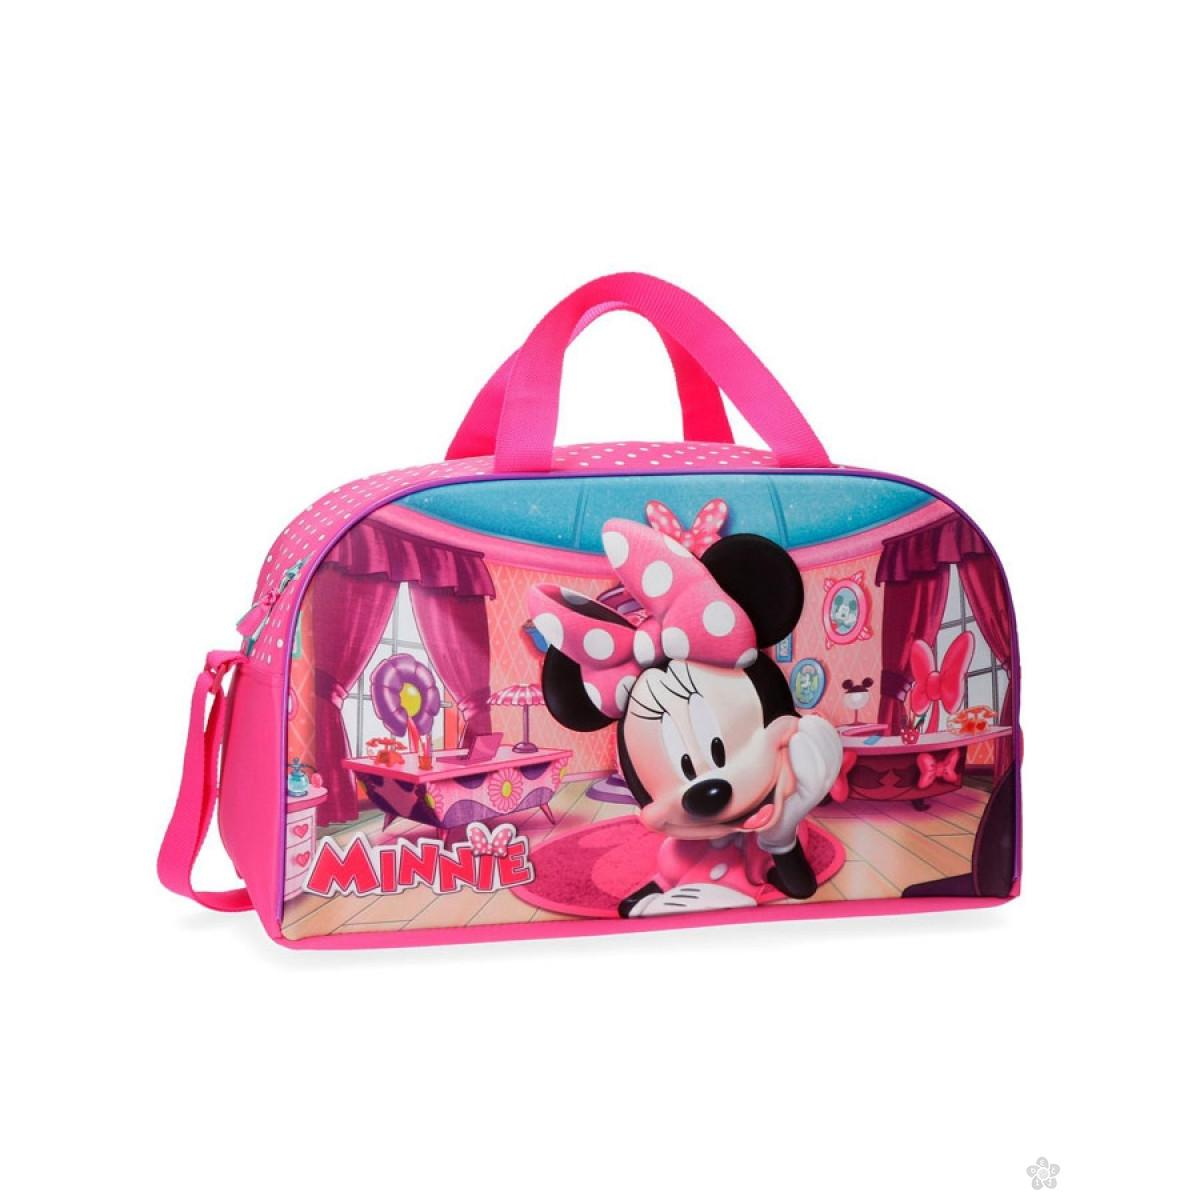 Putna torba Minnie Mouse Smile, 42.933.61